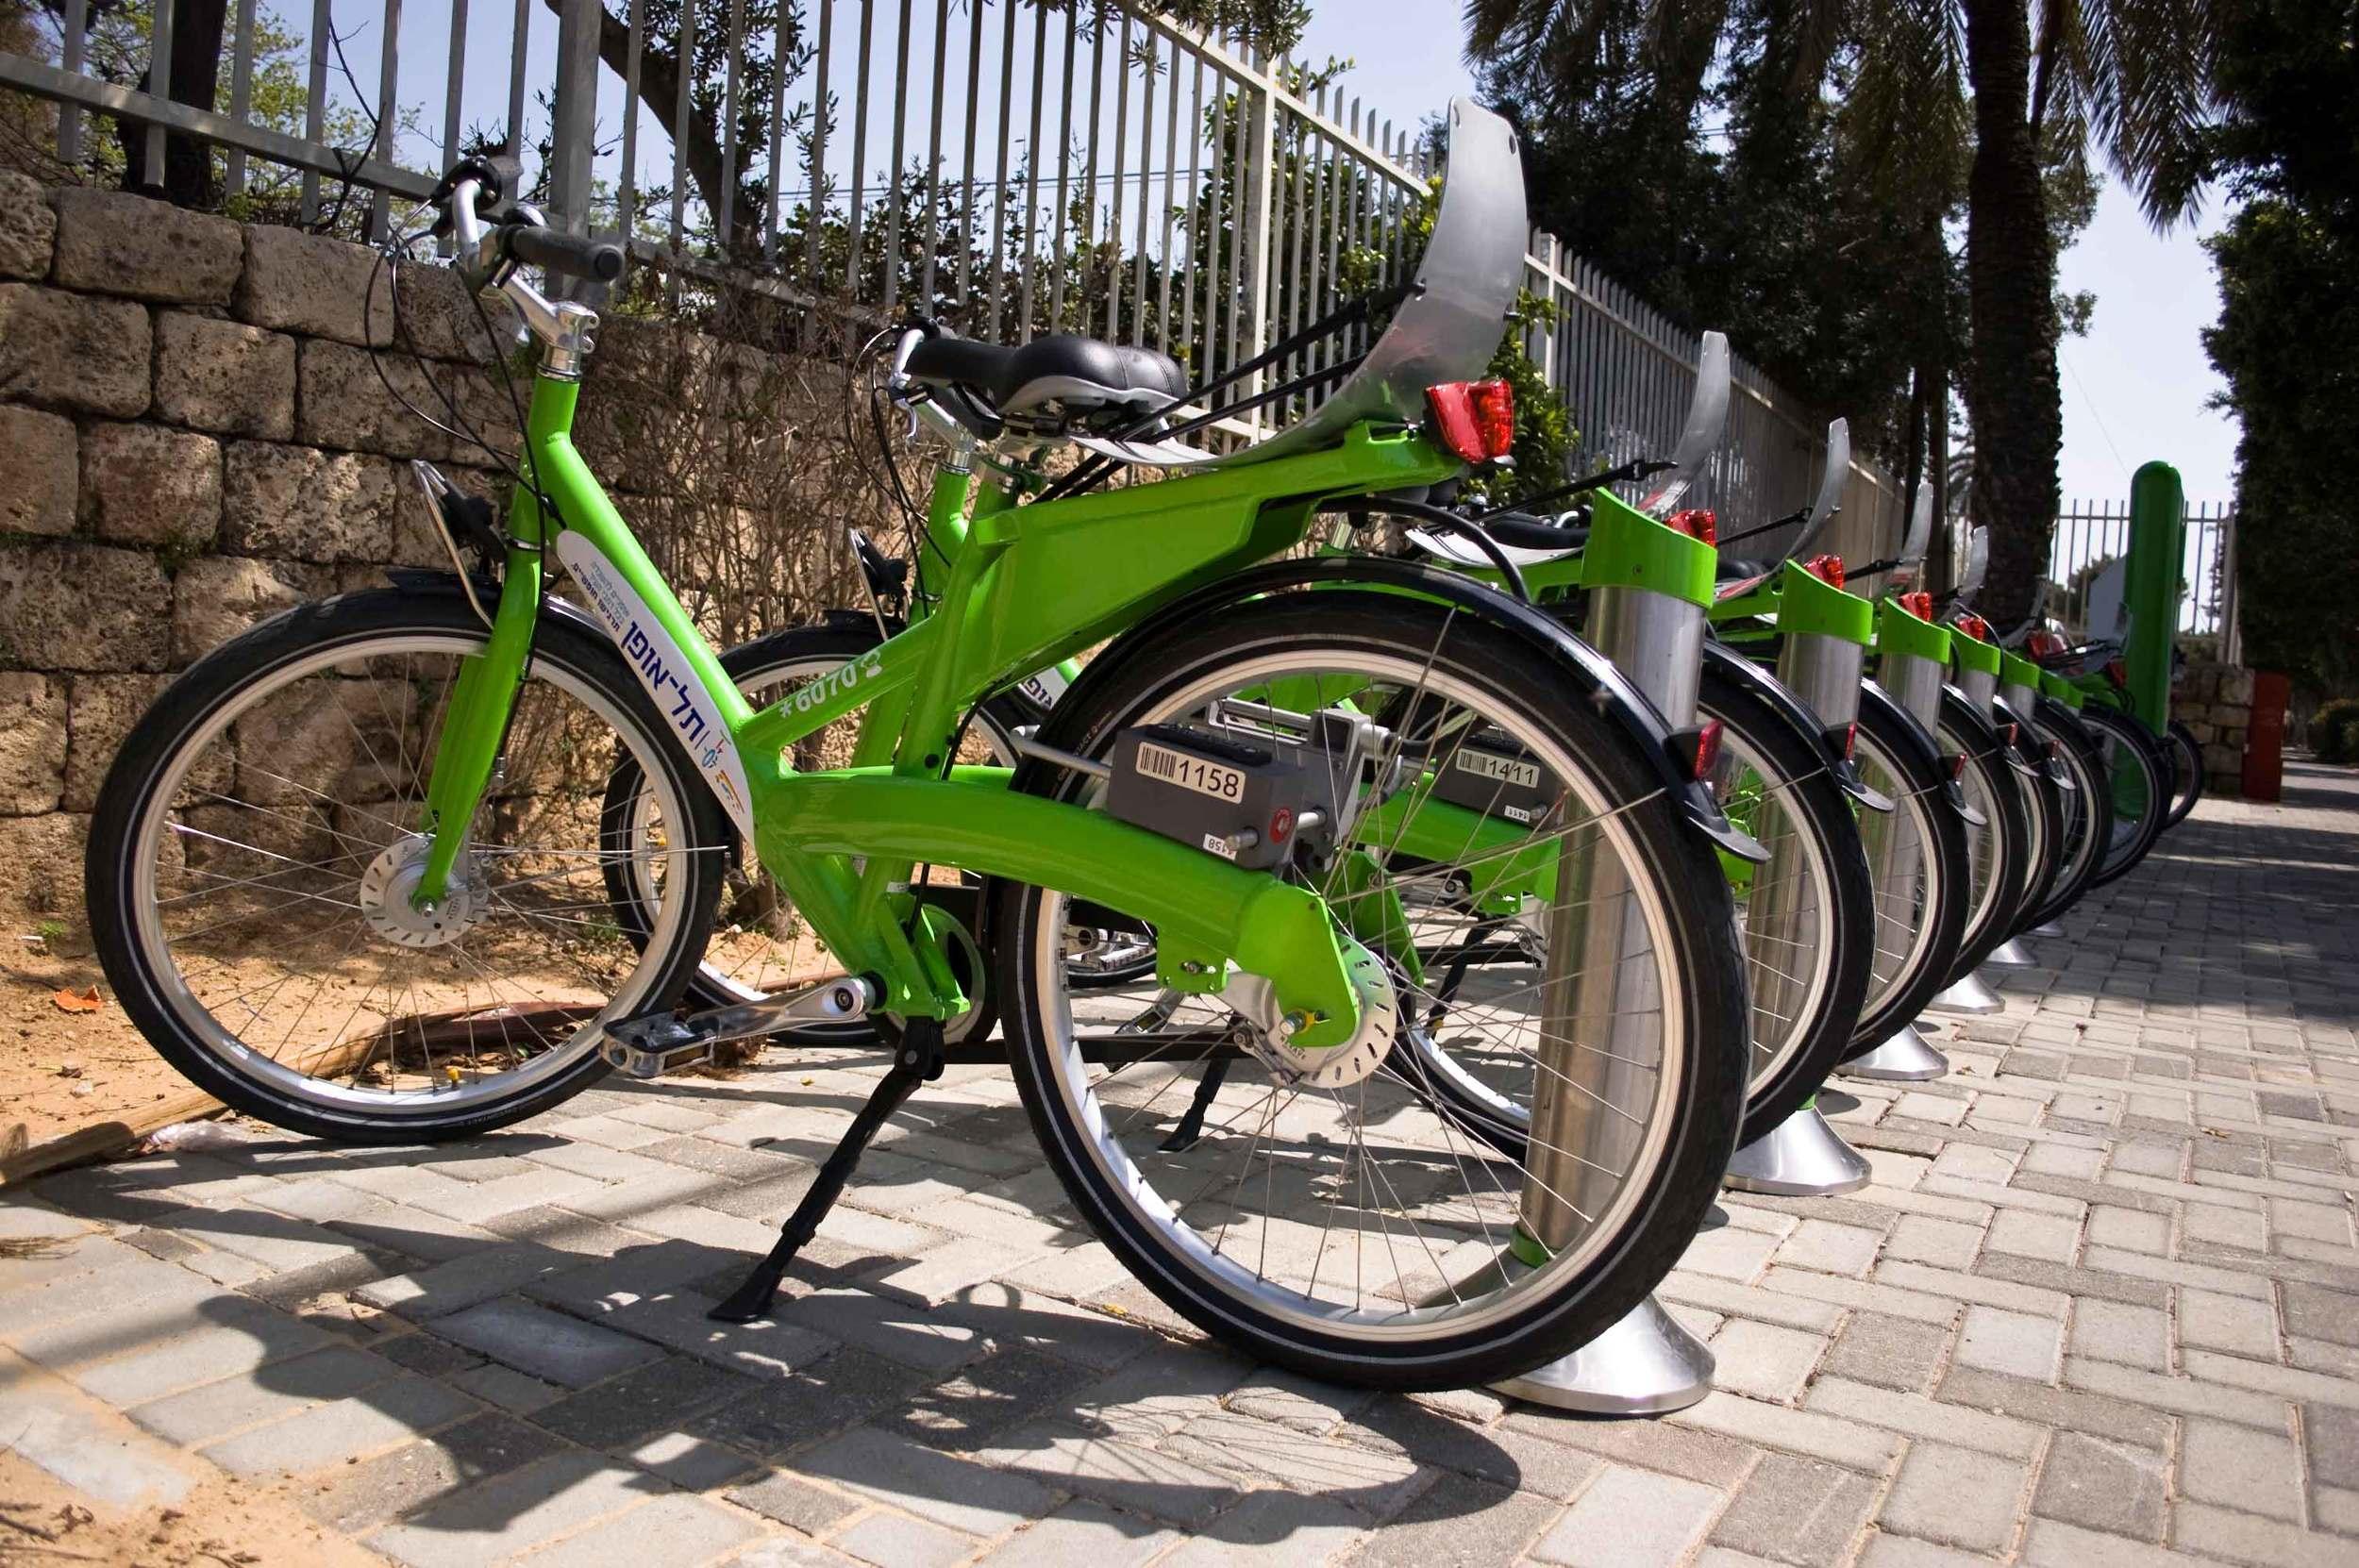 Bike sharing station